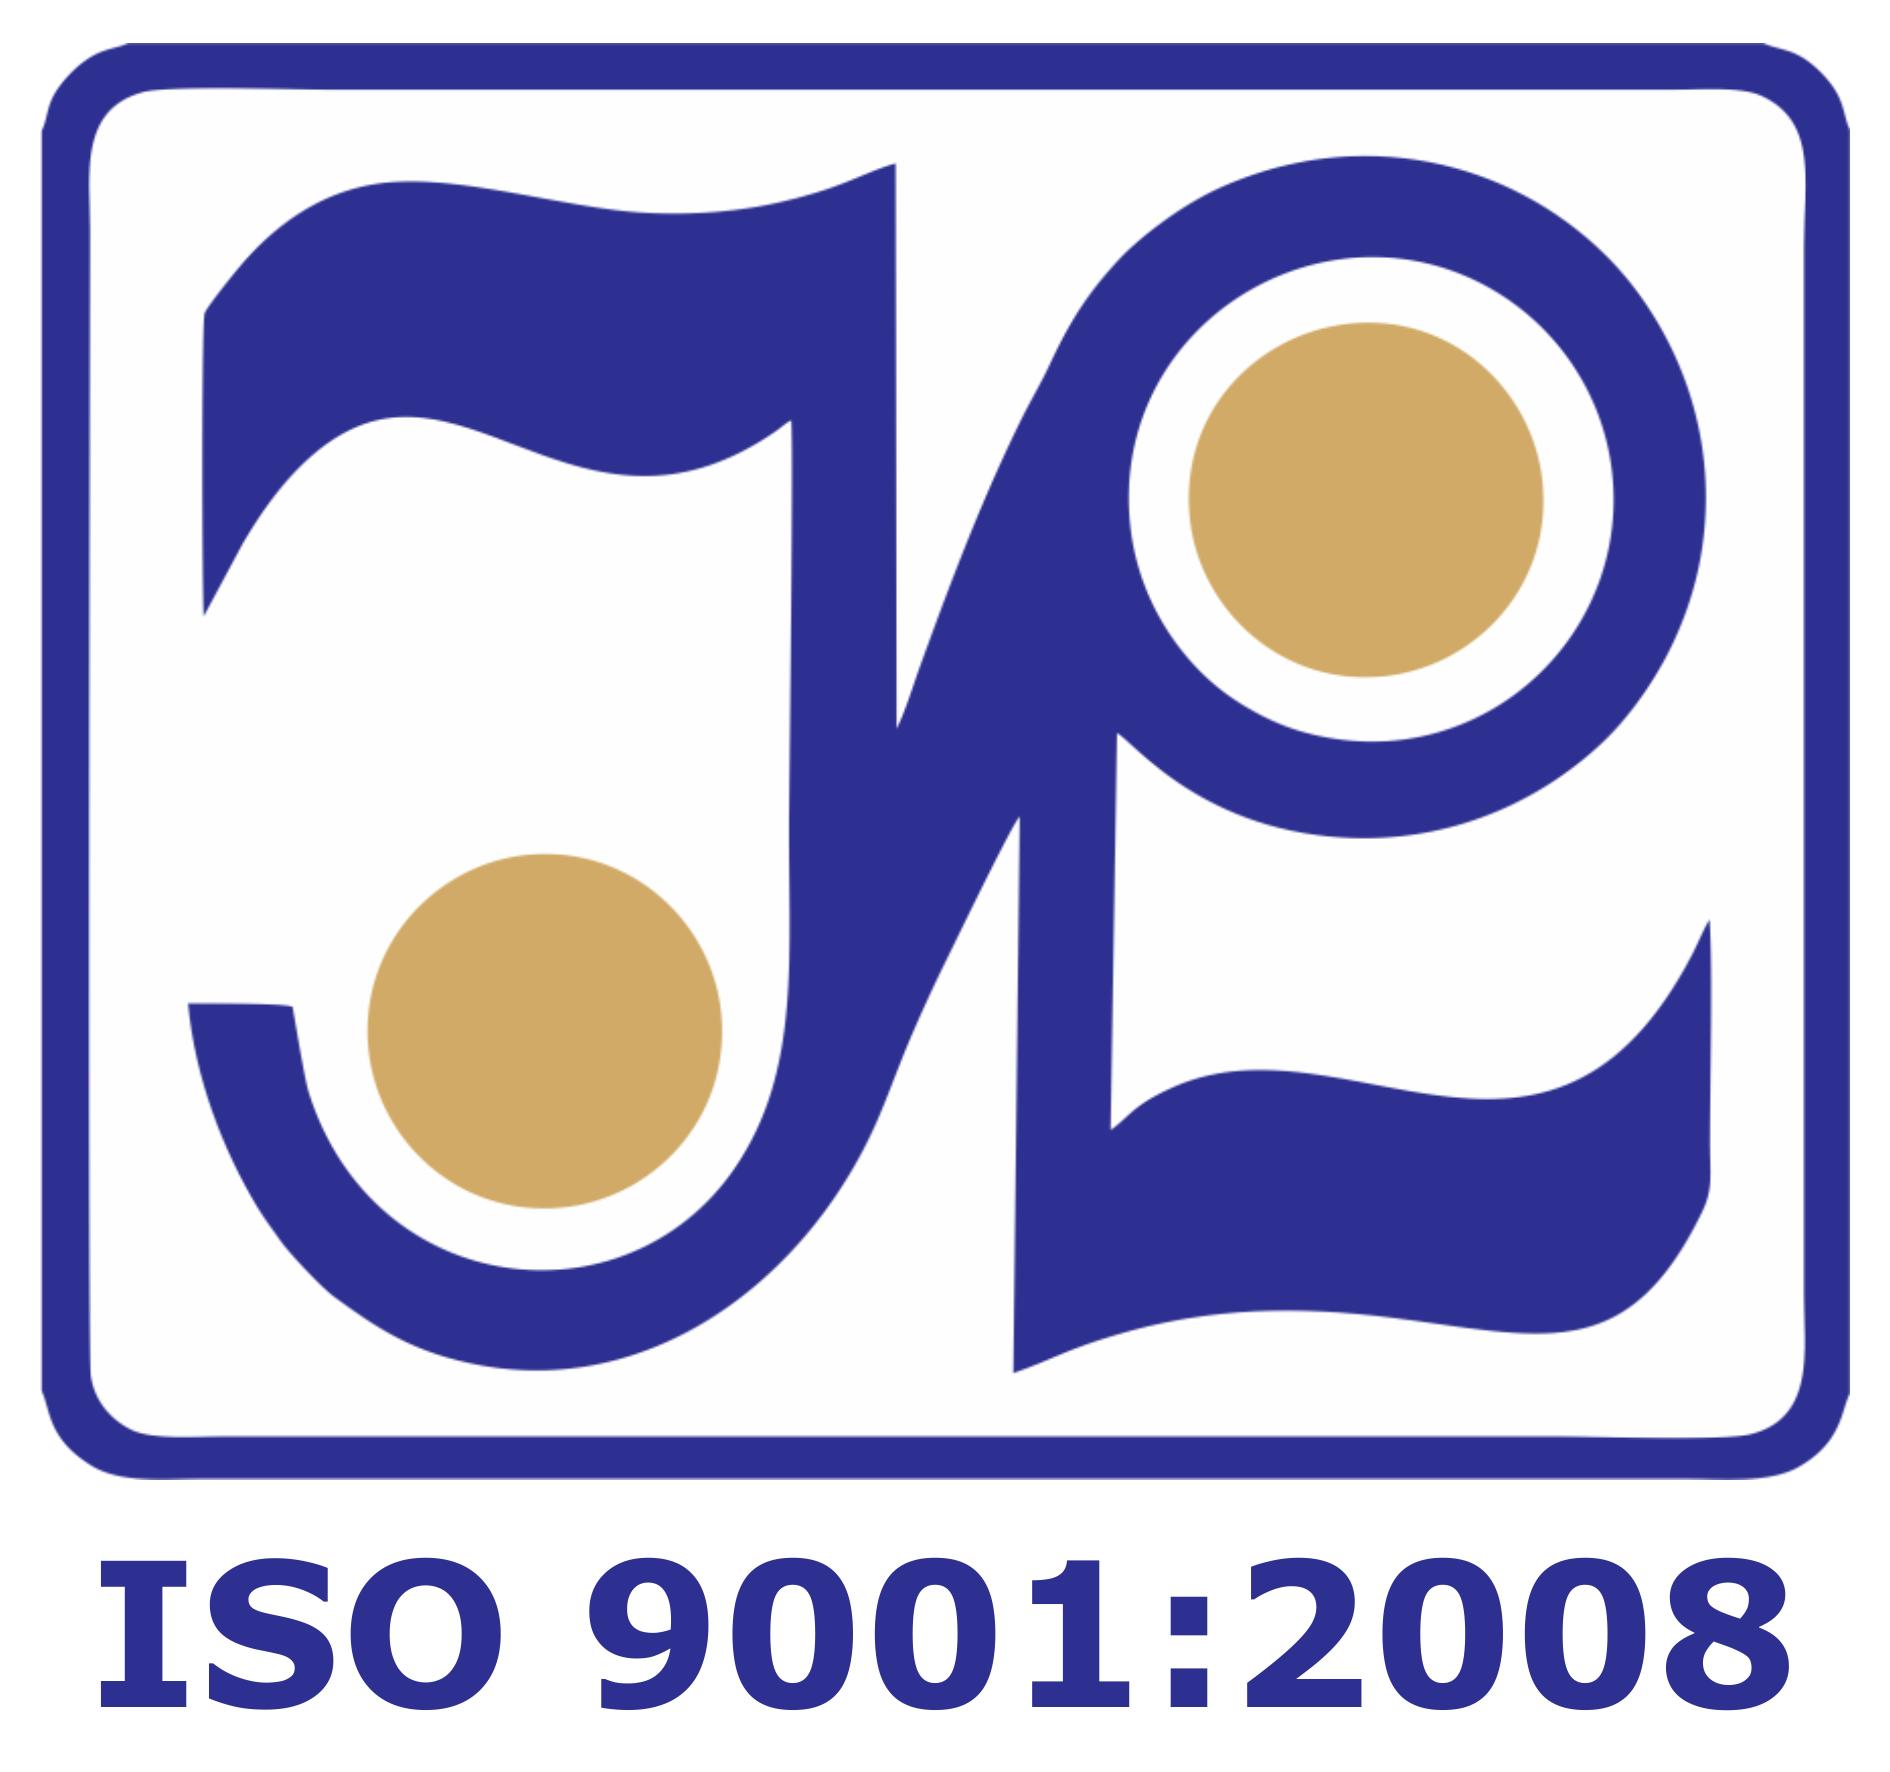 KtpilIso logo